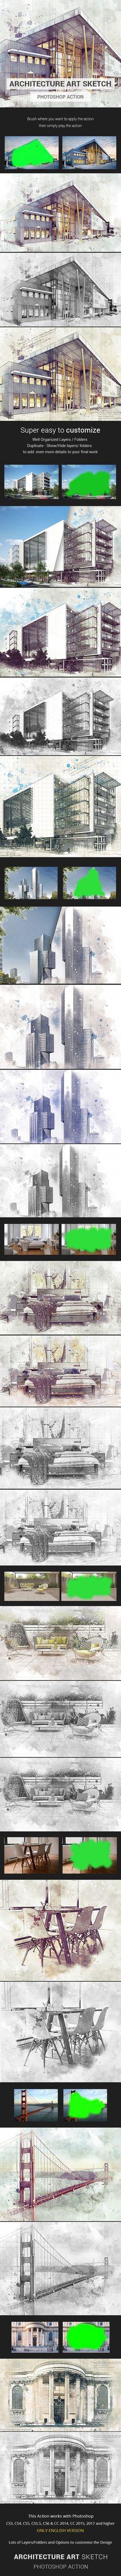 Architecture Sketch Photoshop Action - Advanced